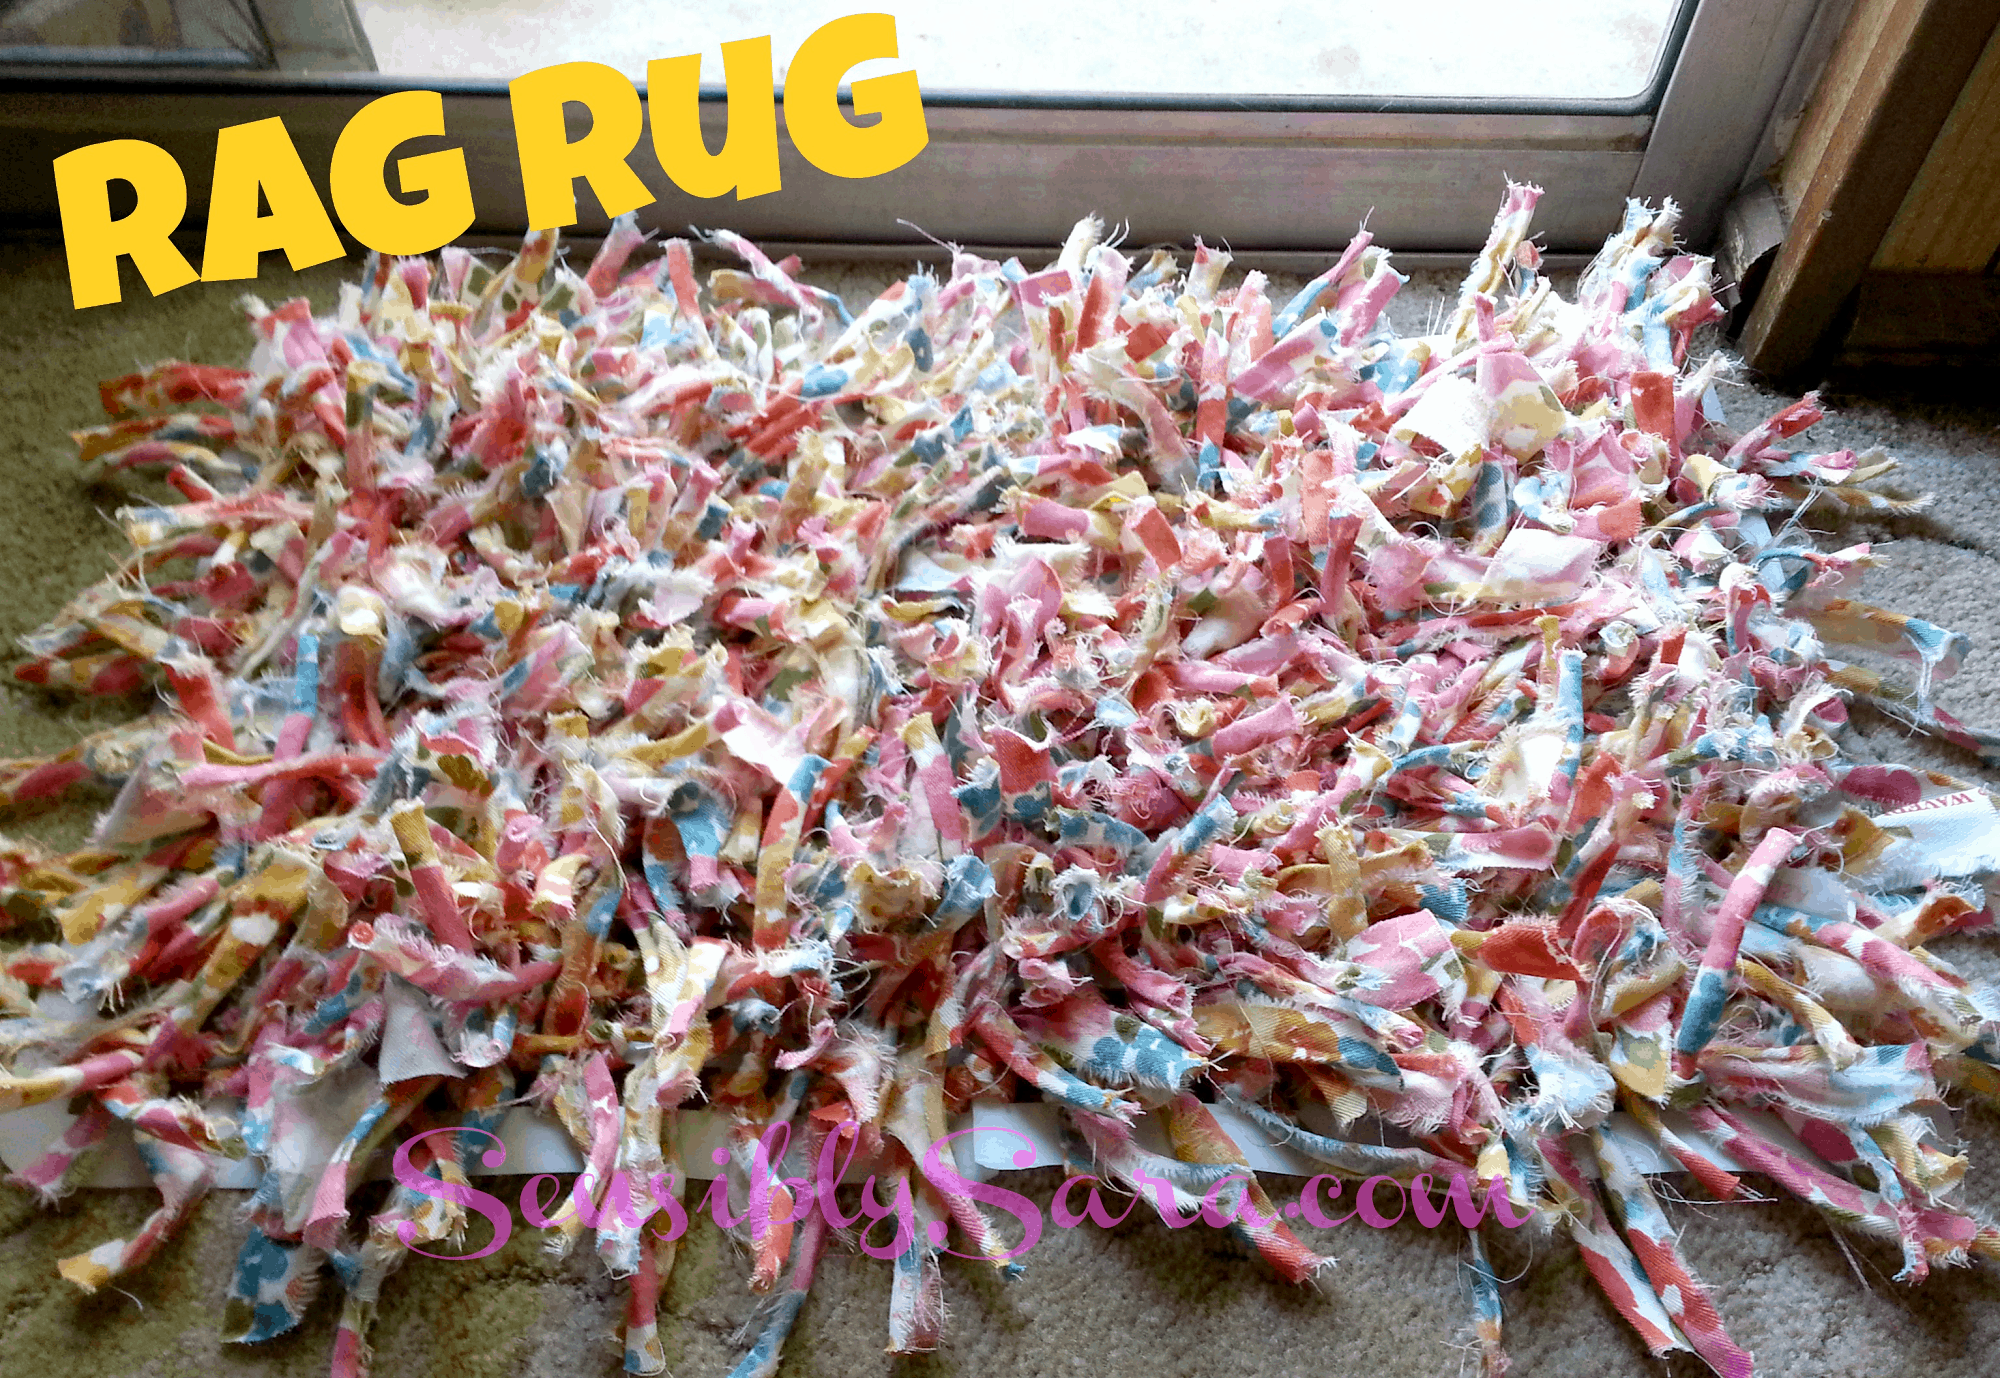 Diy Rag Rugs That Are Super Fun To Make